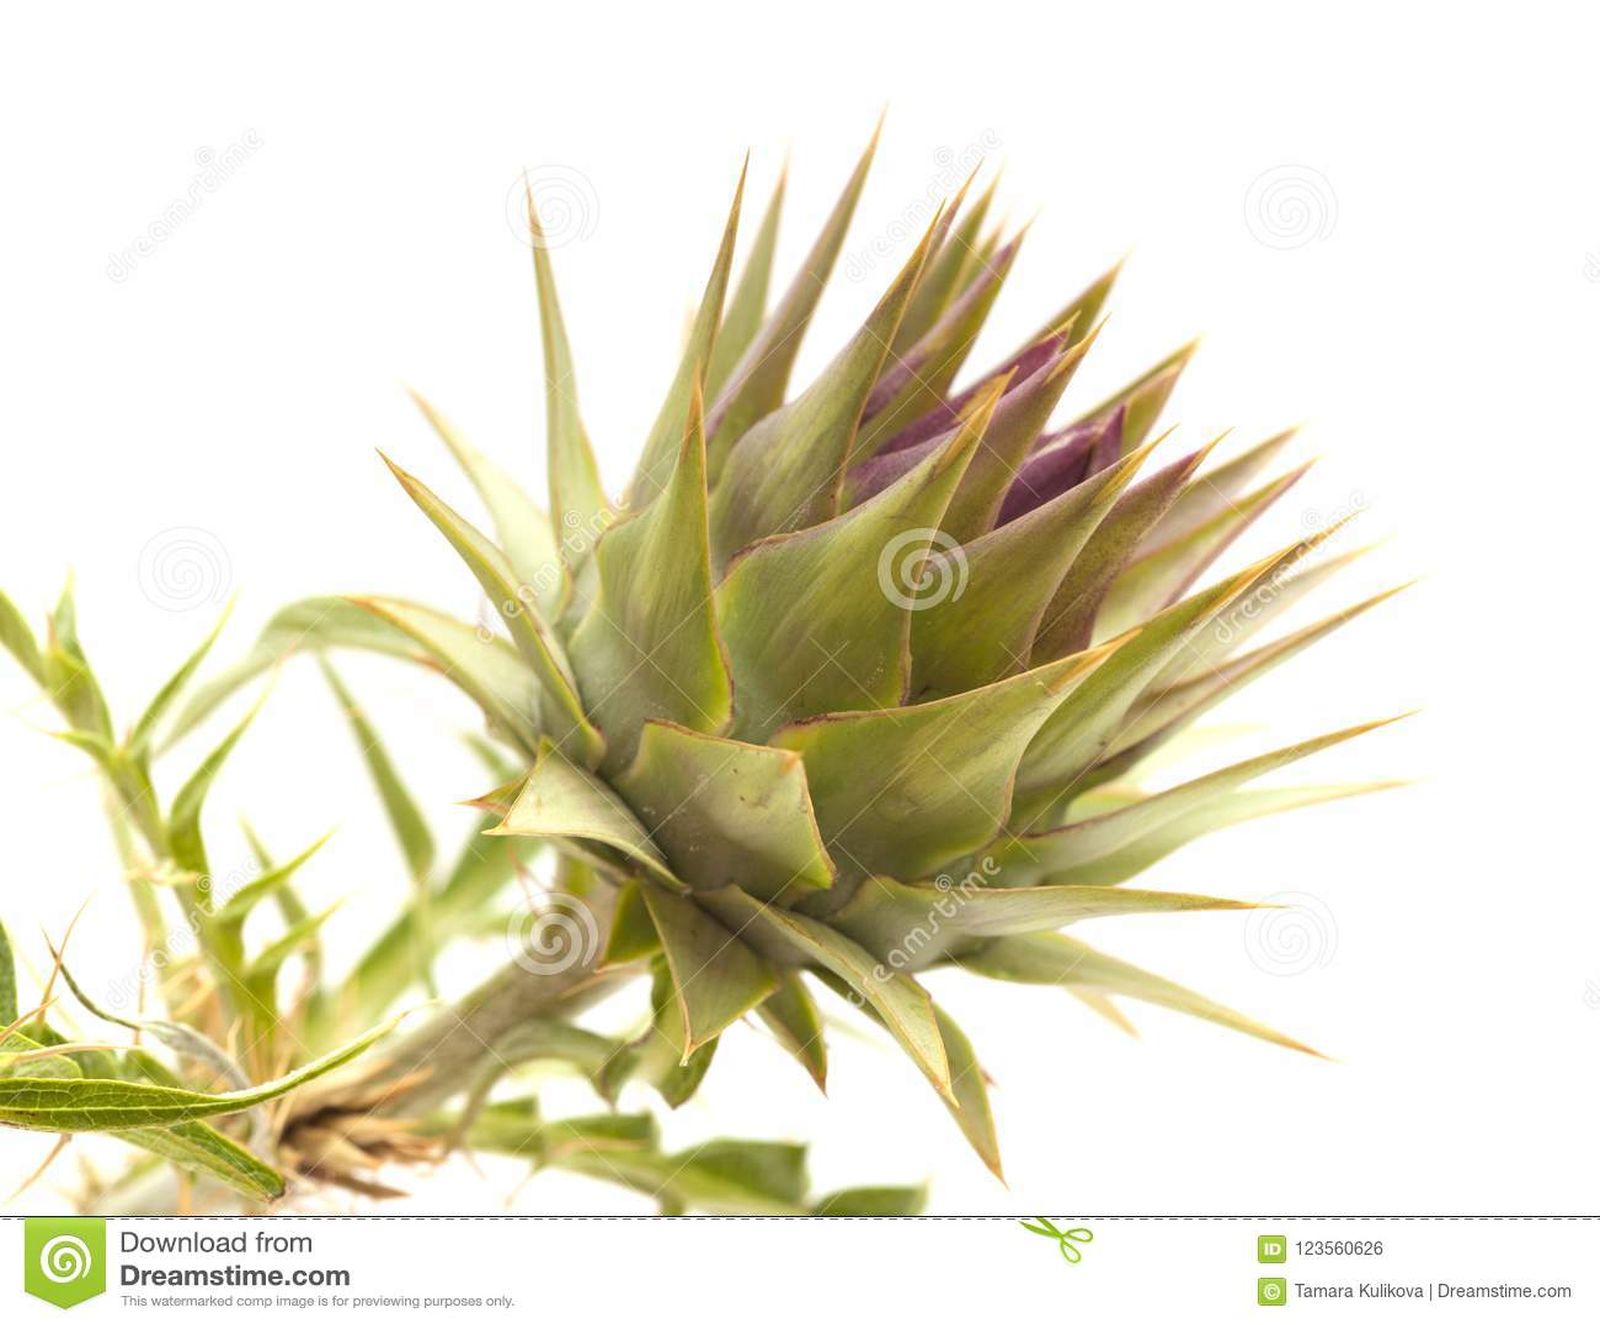 Flora de Gran Canaria - alcachofra